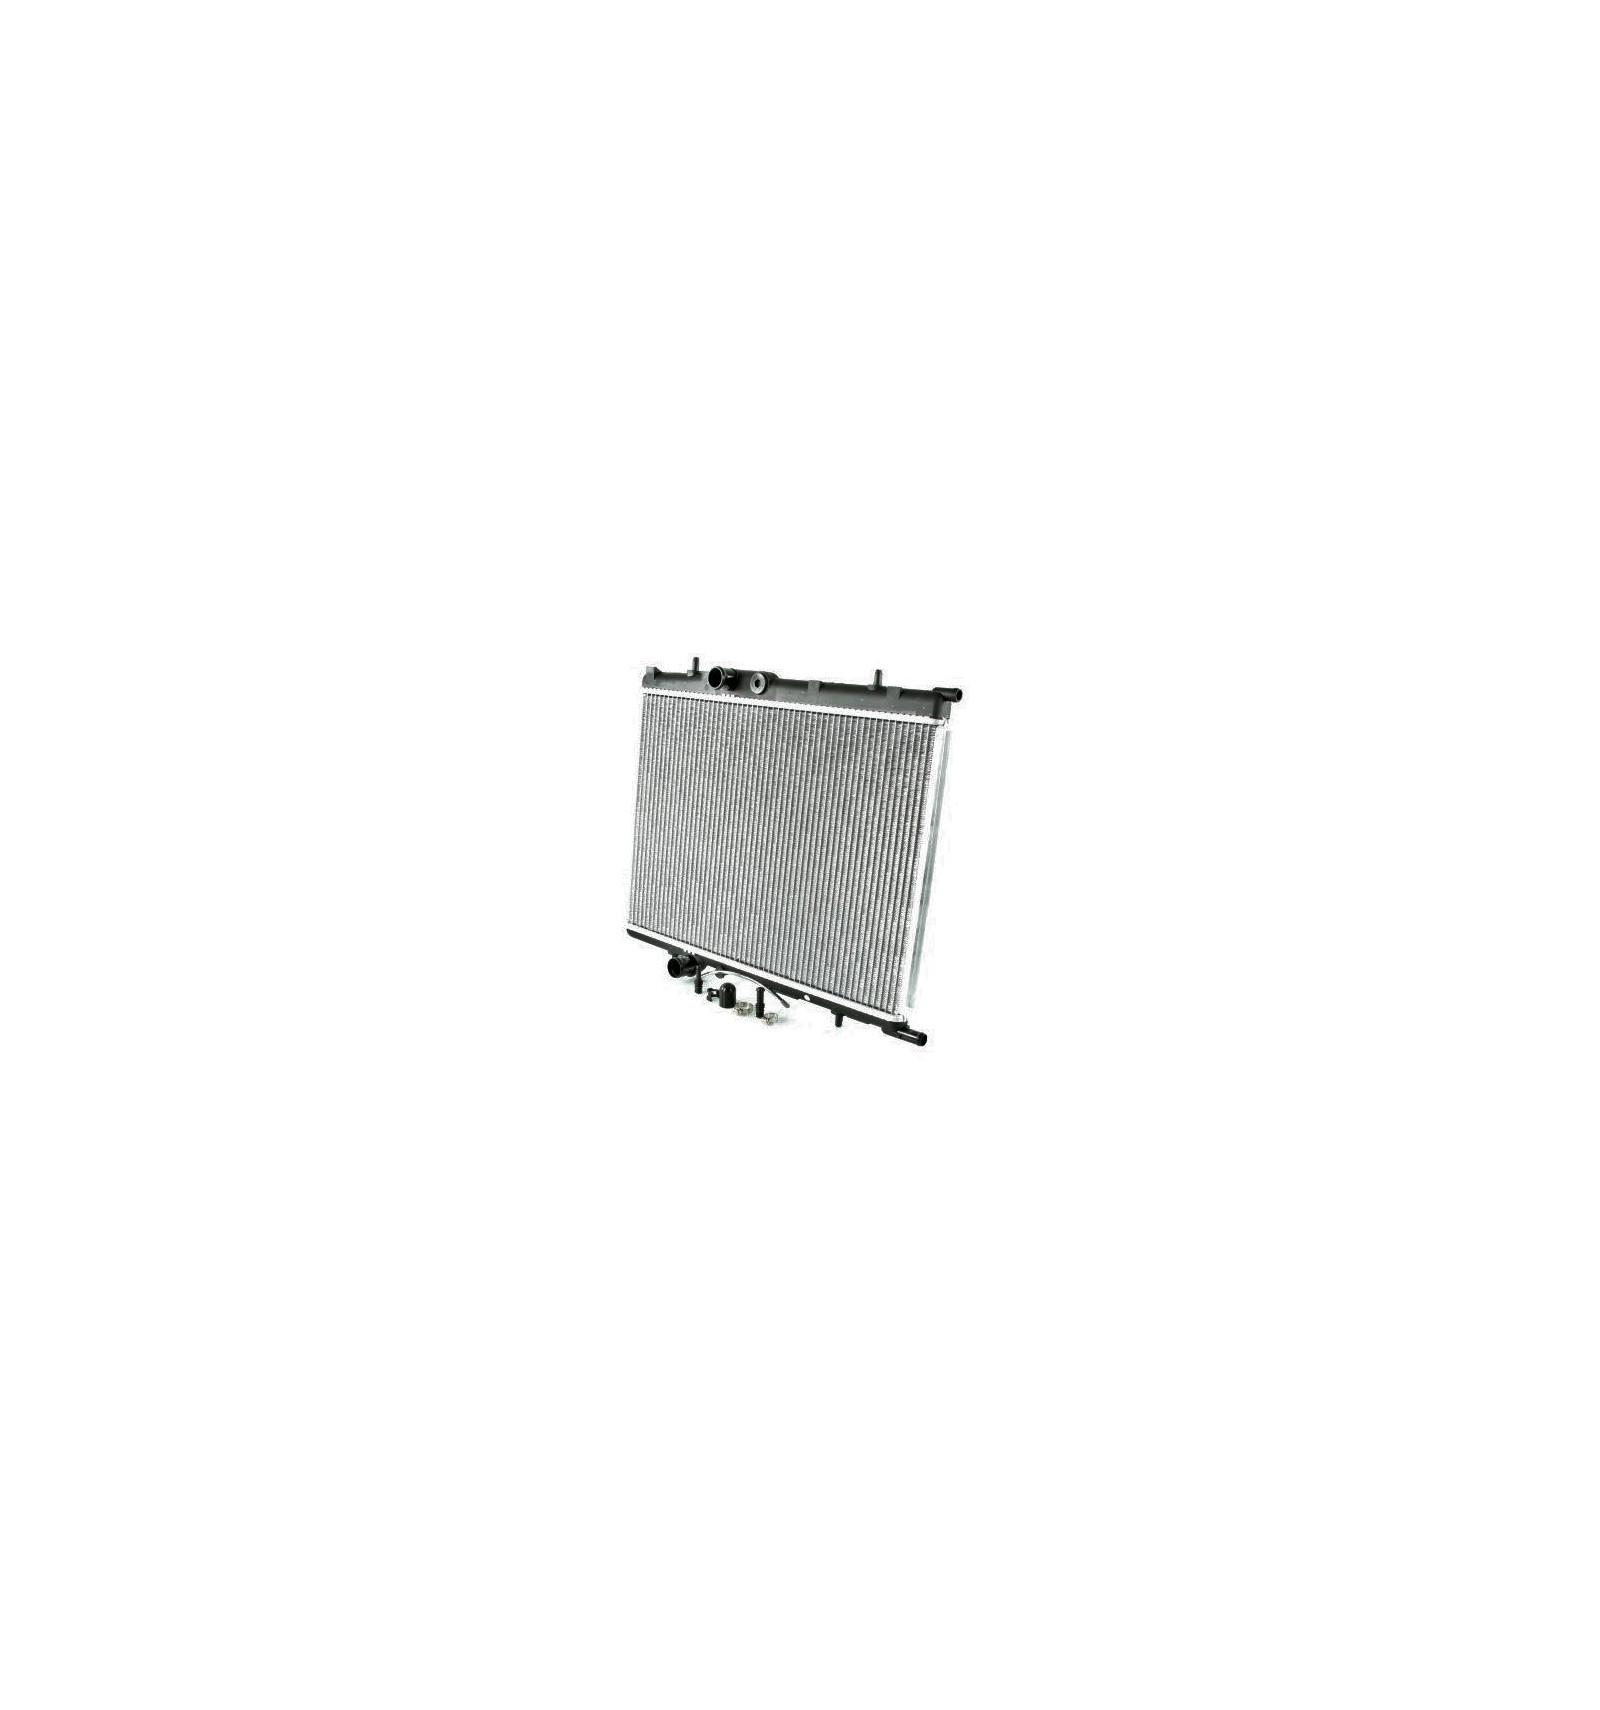 radiateur d eau refroidissement citroen c4 berlingo picasso xsara peugeot partner 206 307. Black Bedroom Furniture Sets. Home Design Ideas